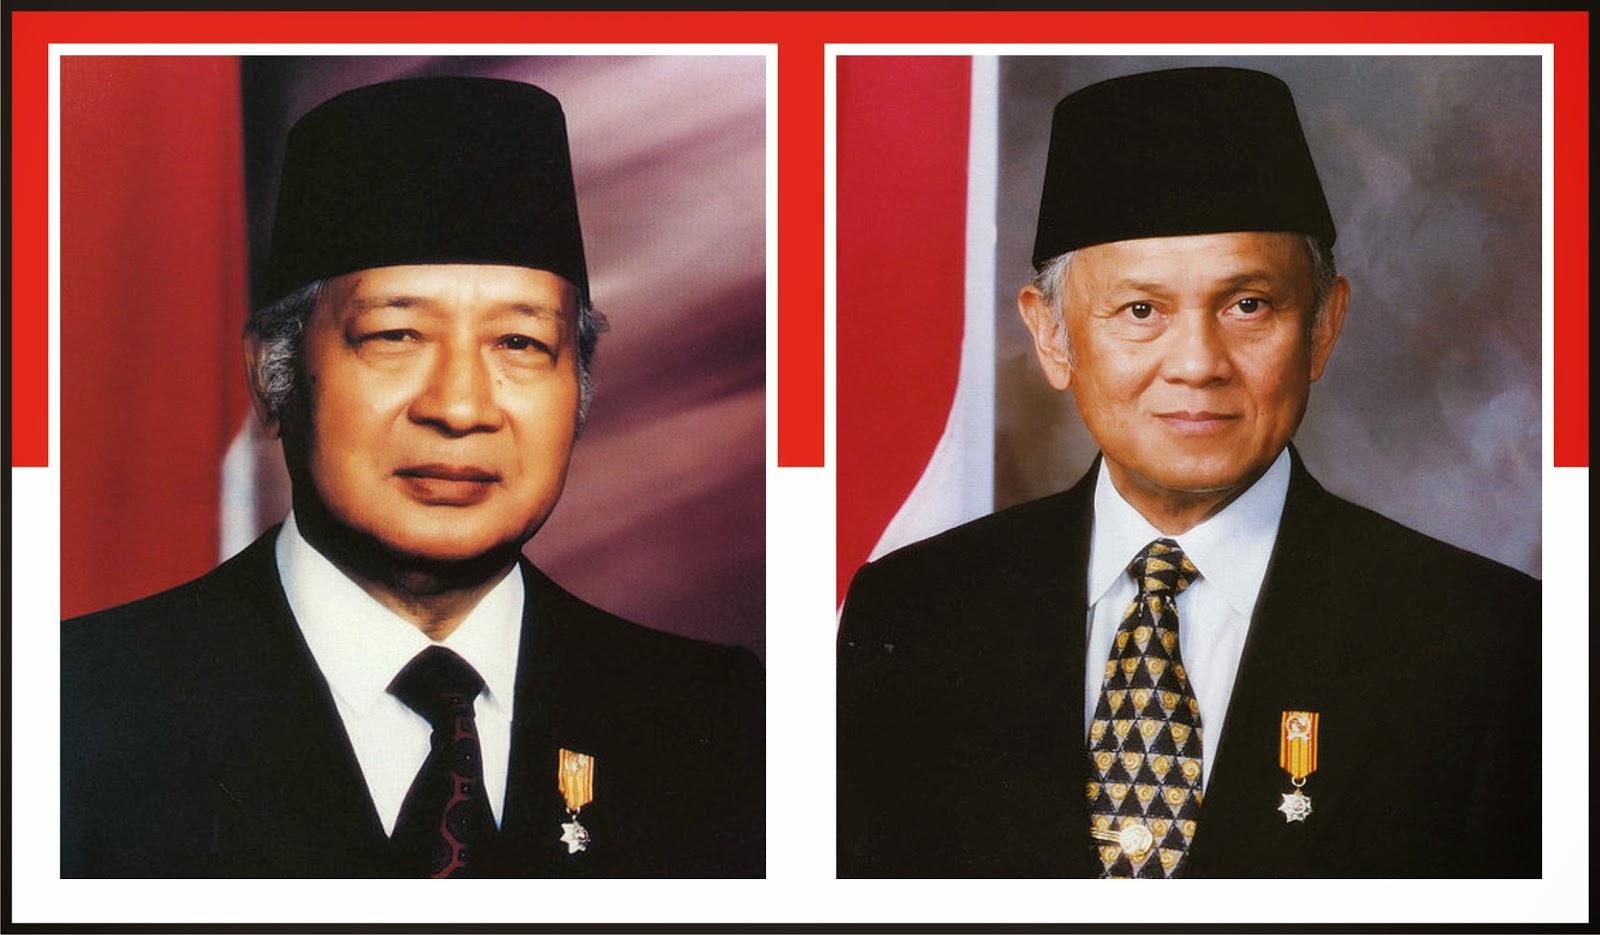 Gambar Presiden Soeharto dan Bacharuddin Jusuf Habibie